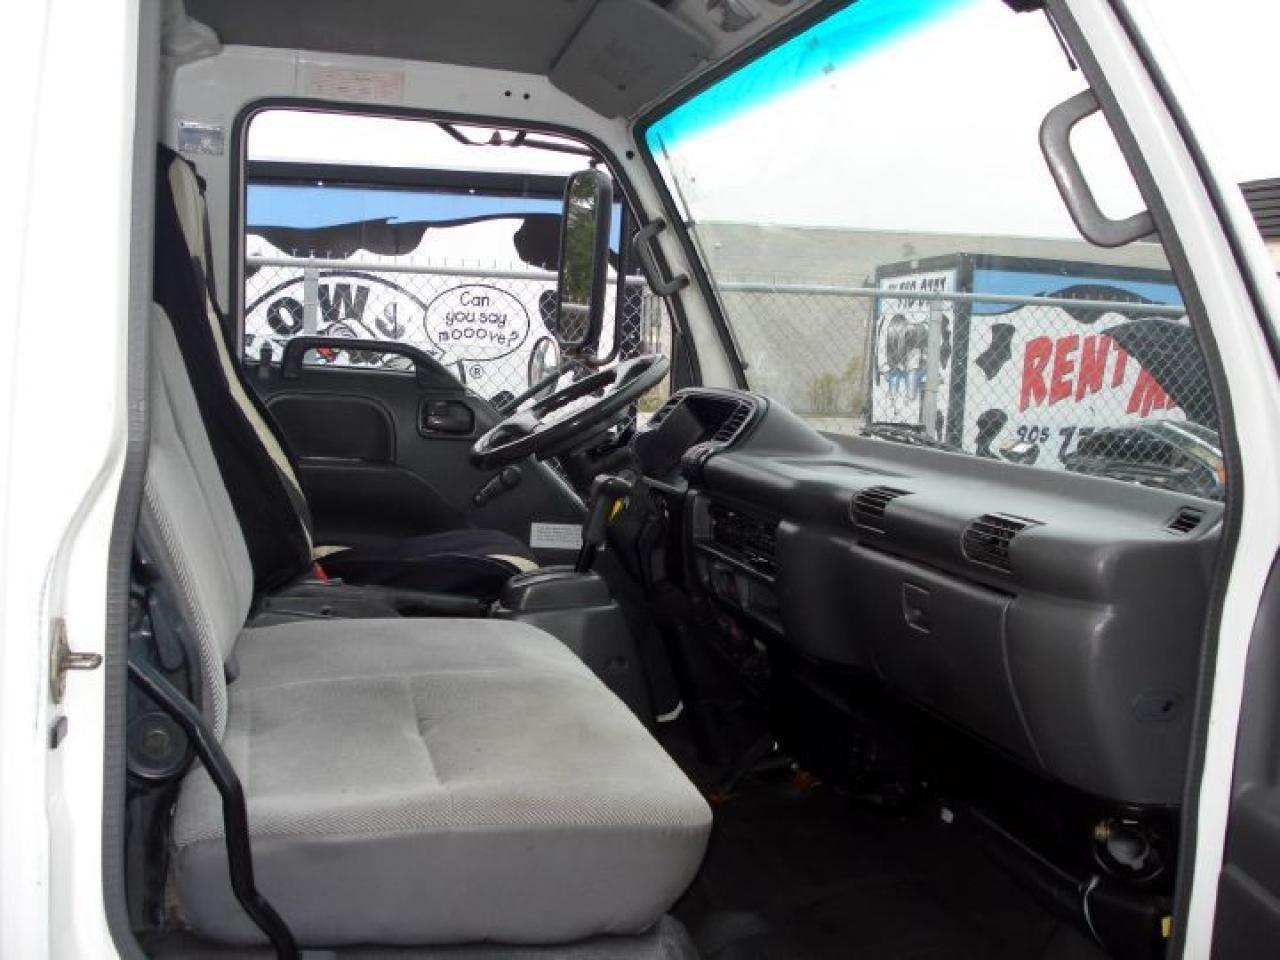 2004 GMC W5500 Tilt Cab, Turbo Diesel